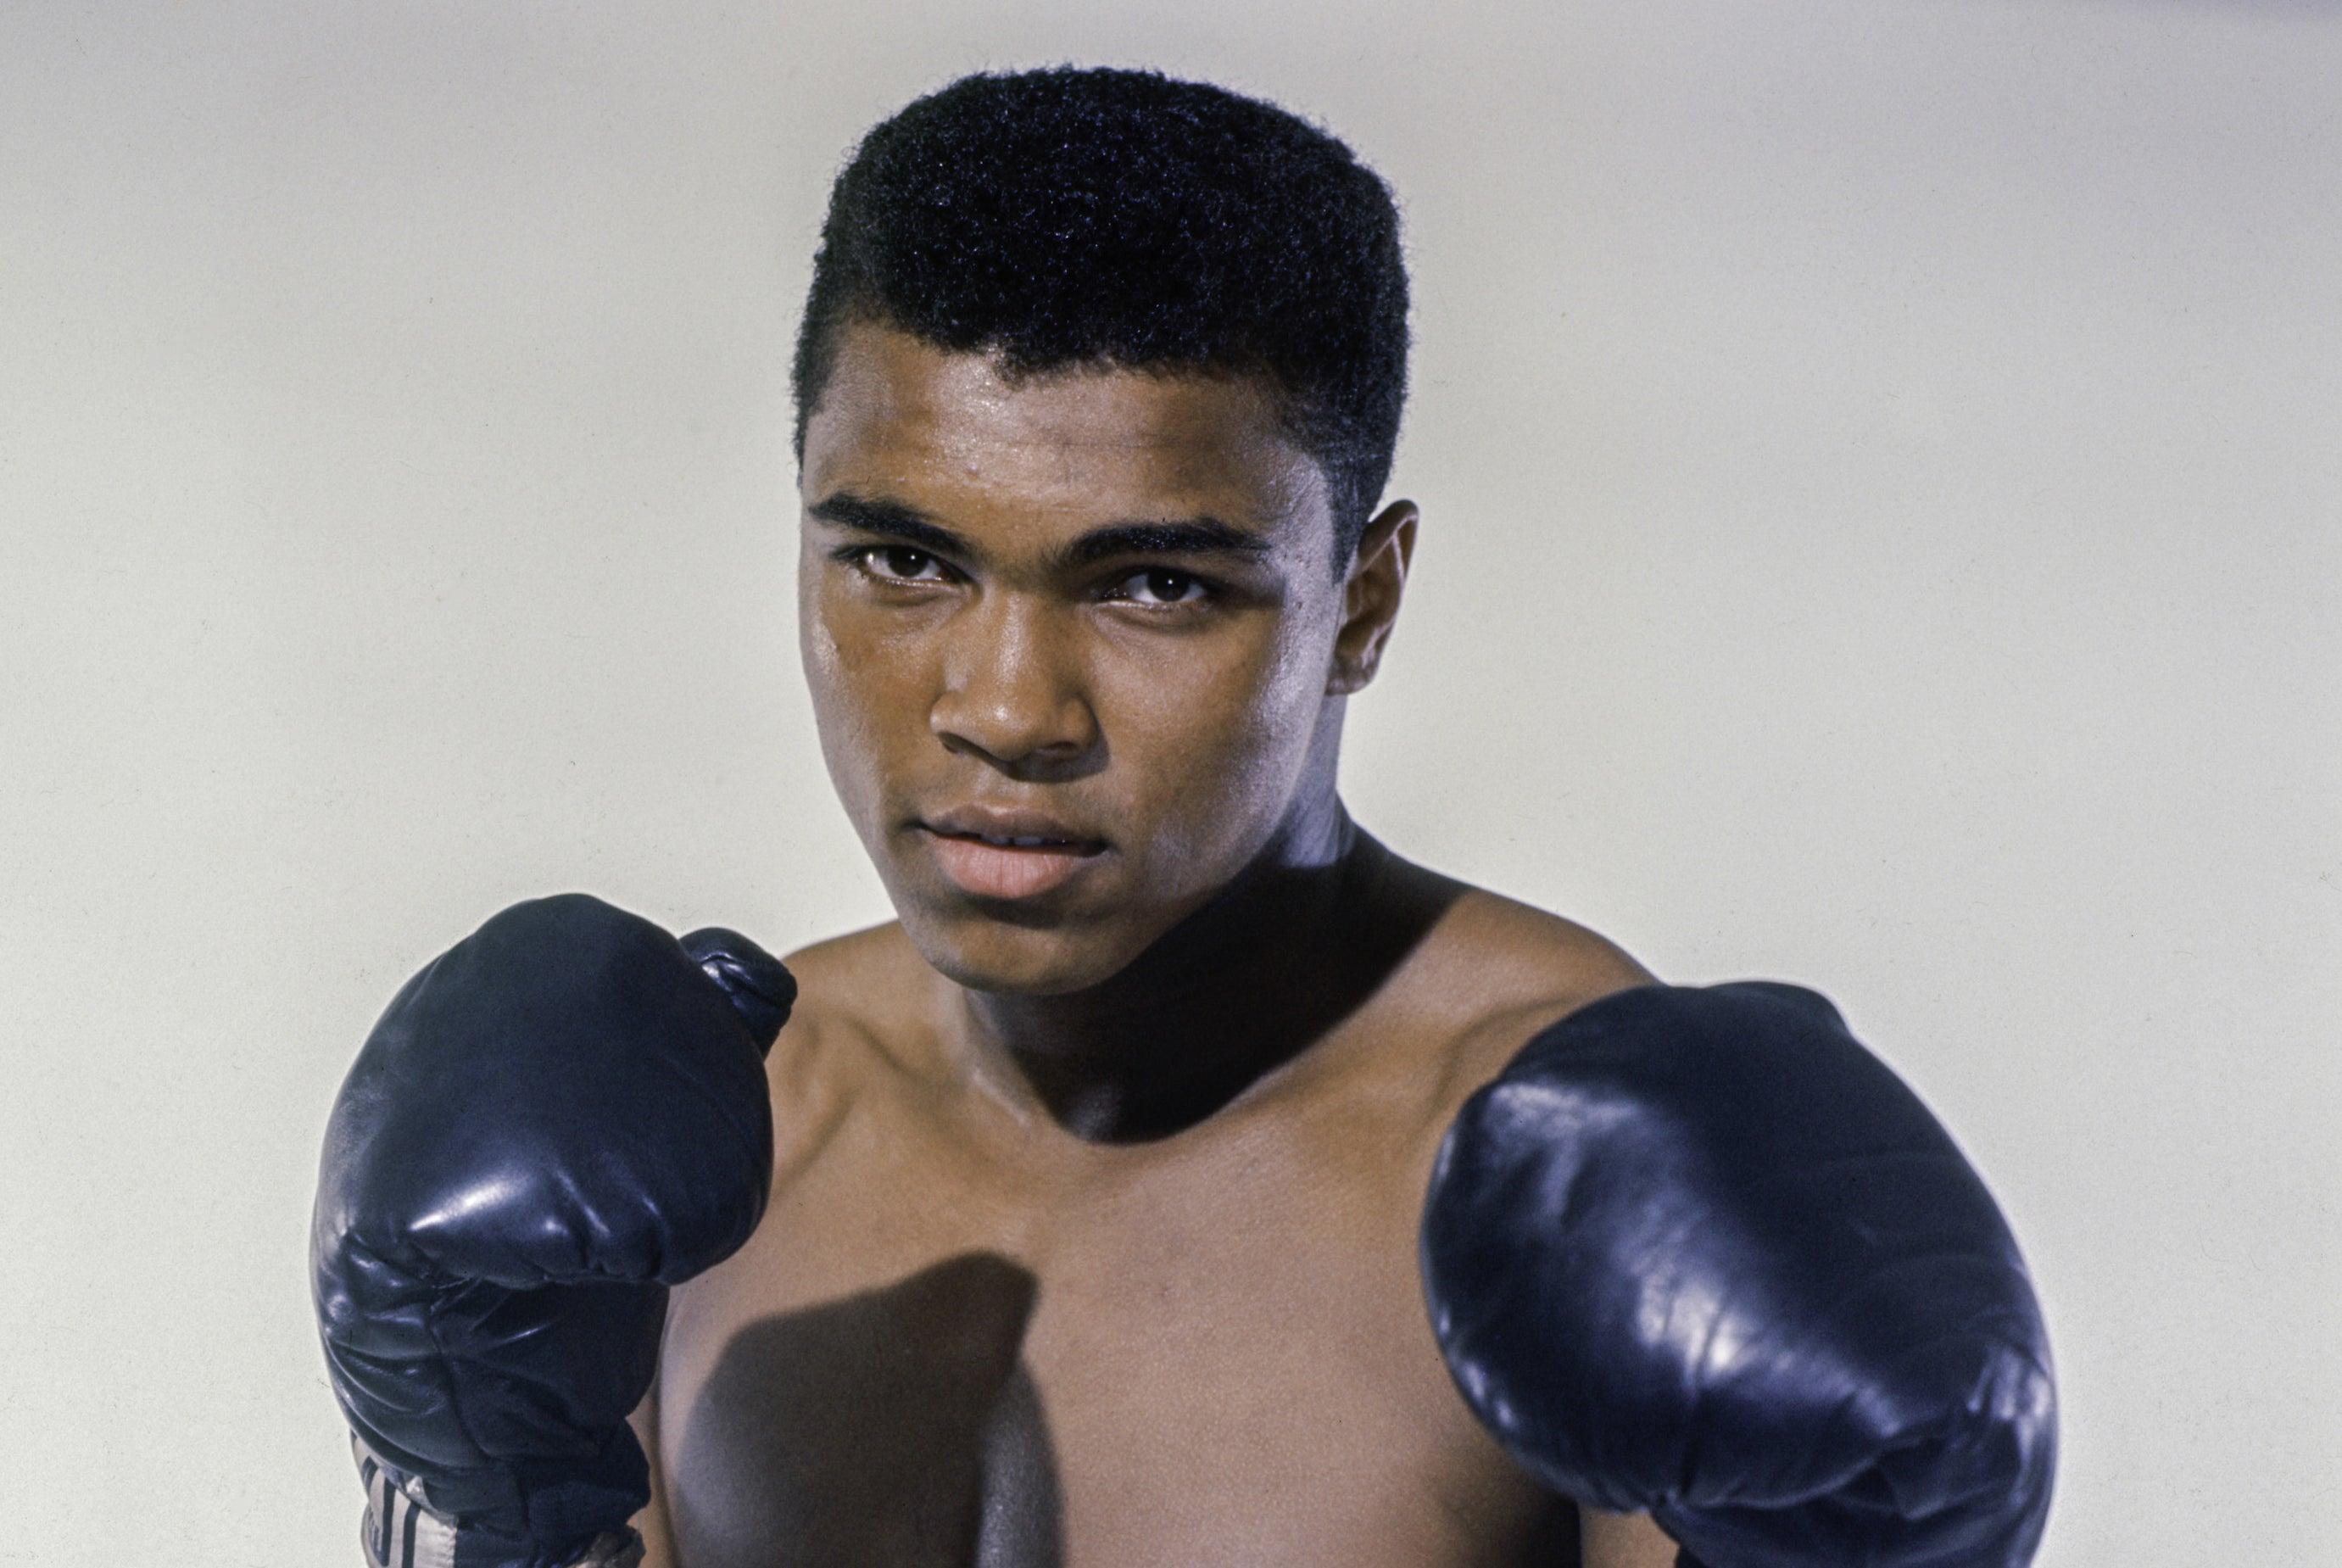 Photo of Muhammad Ali wearing boxing gloves